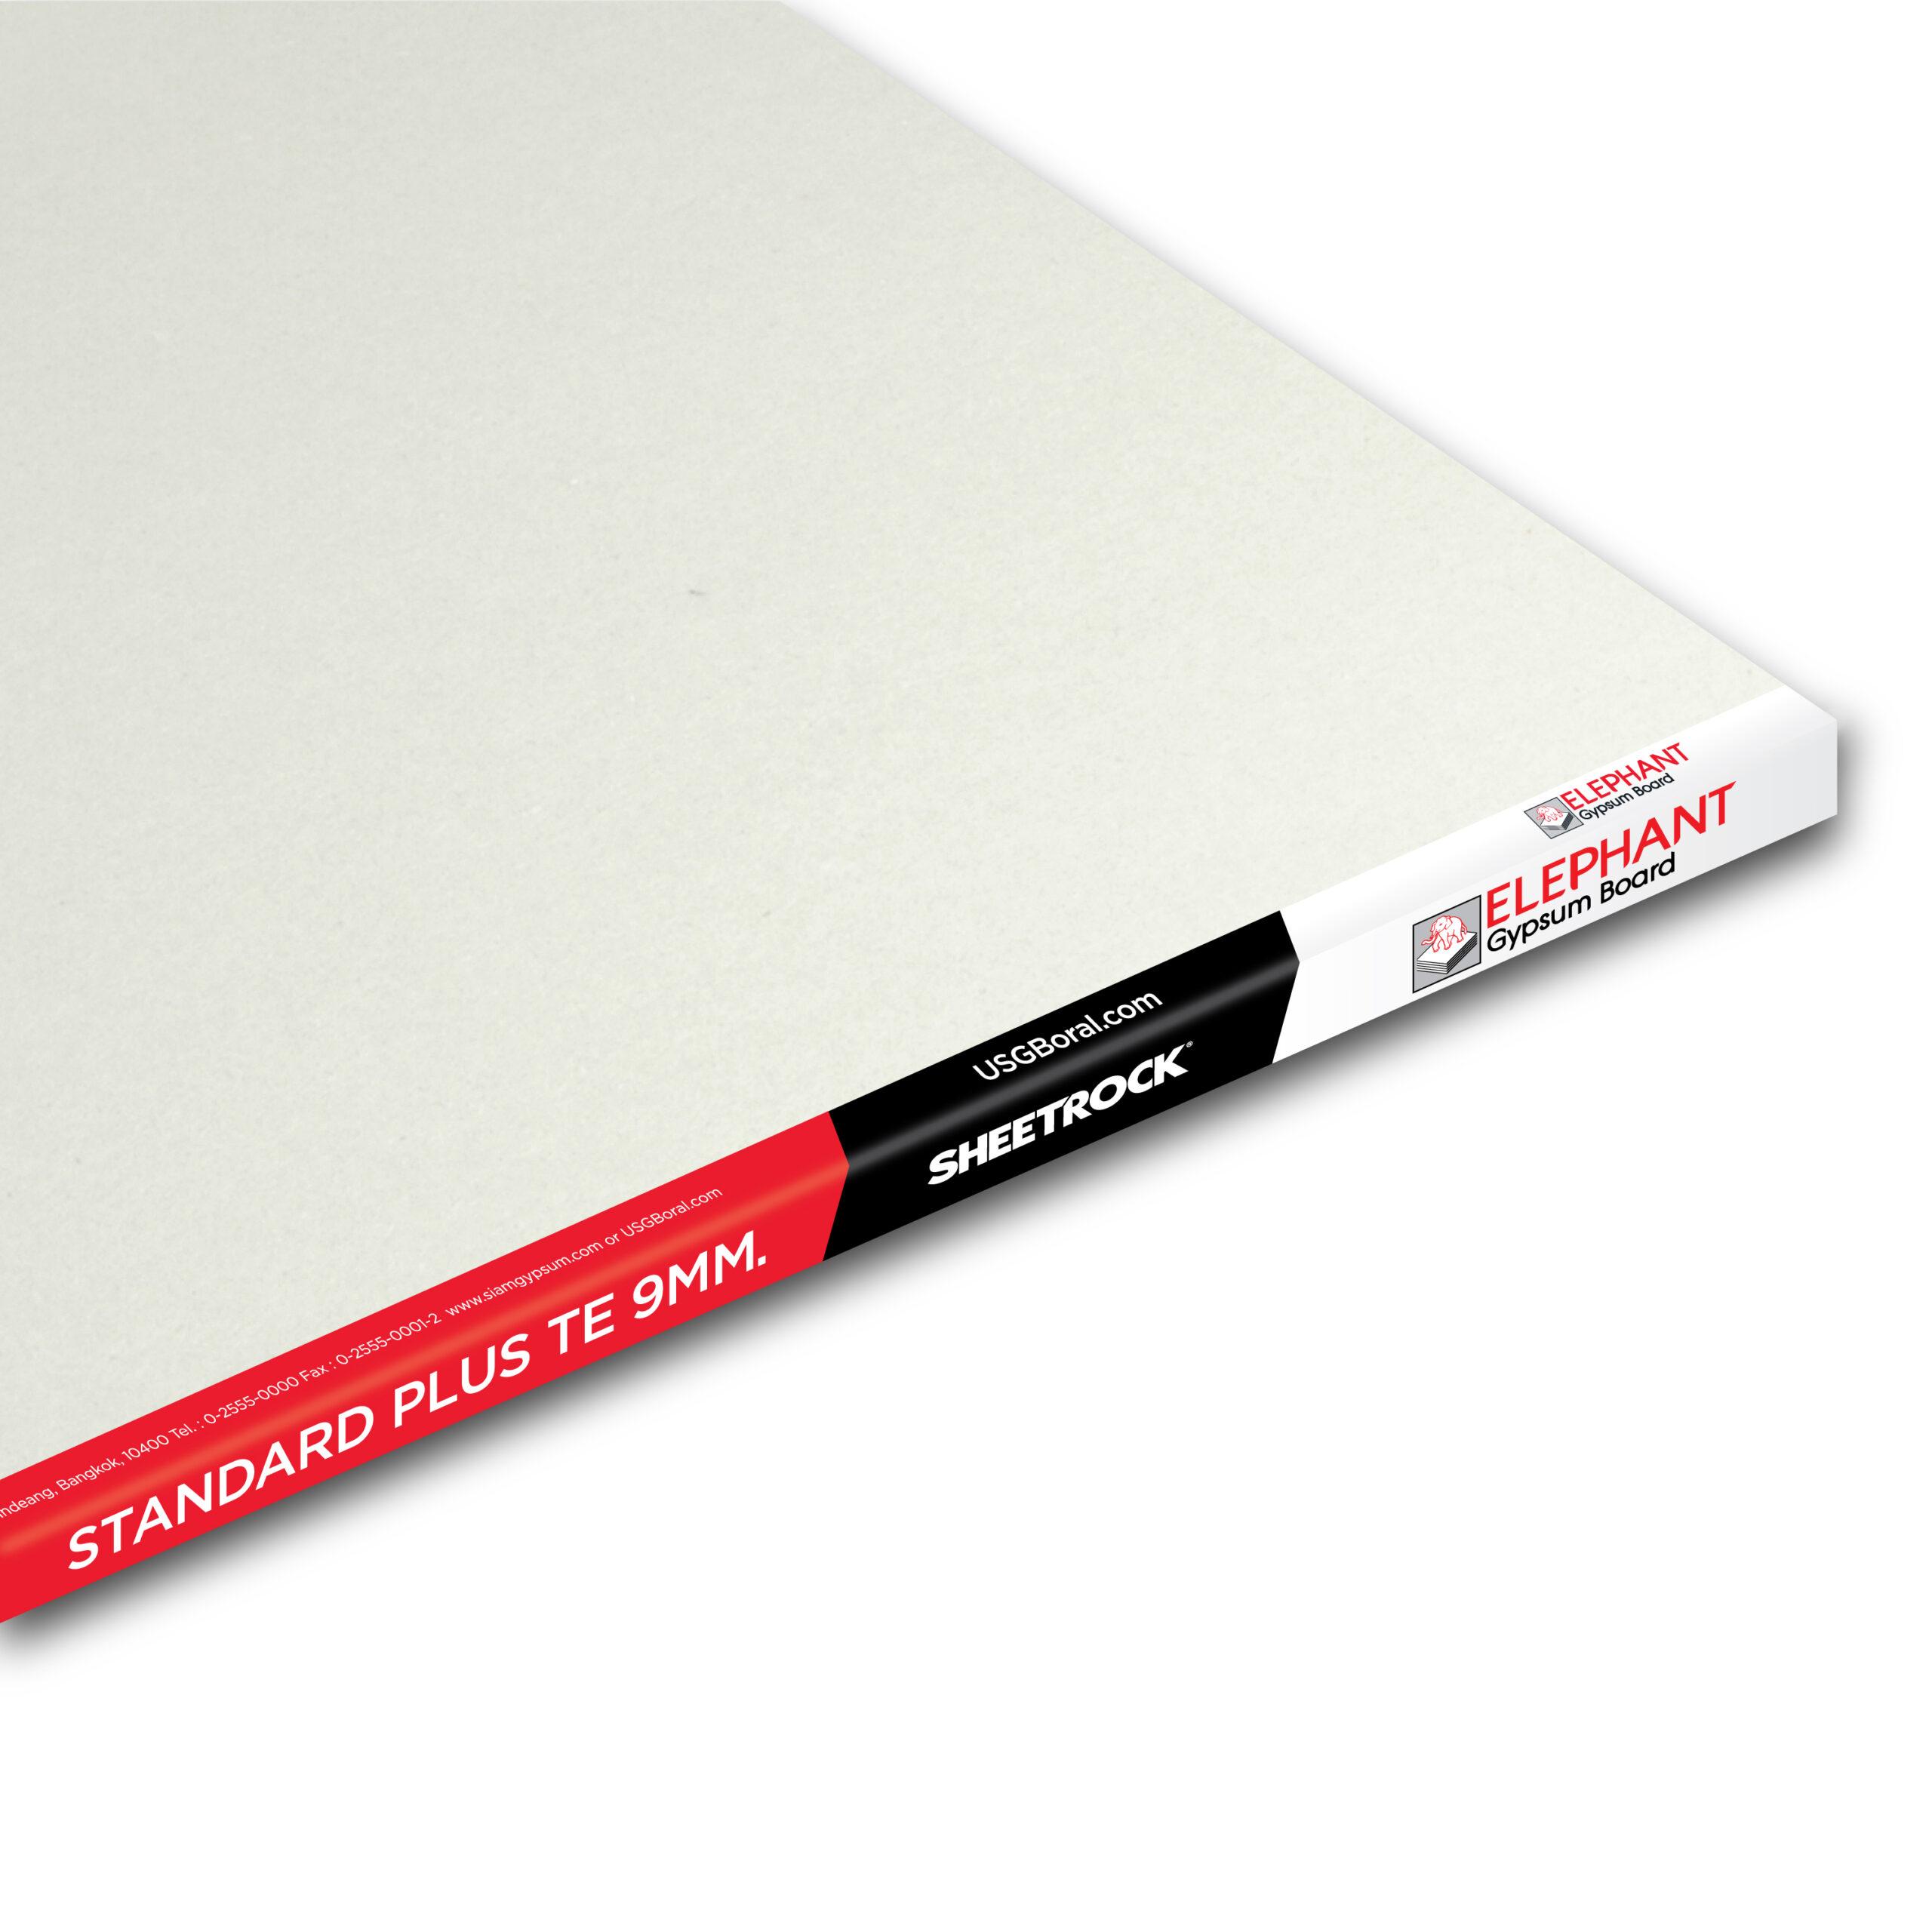 Best Gypsum Board Wall Ceiling Standard Plus-9MM-TE-3000x3000